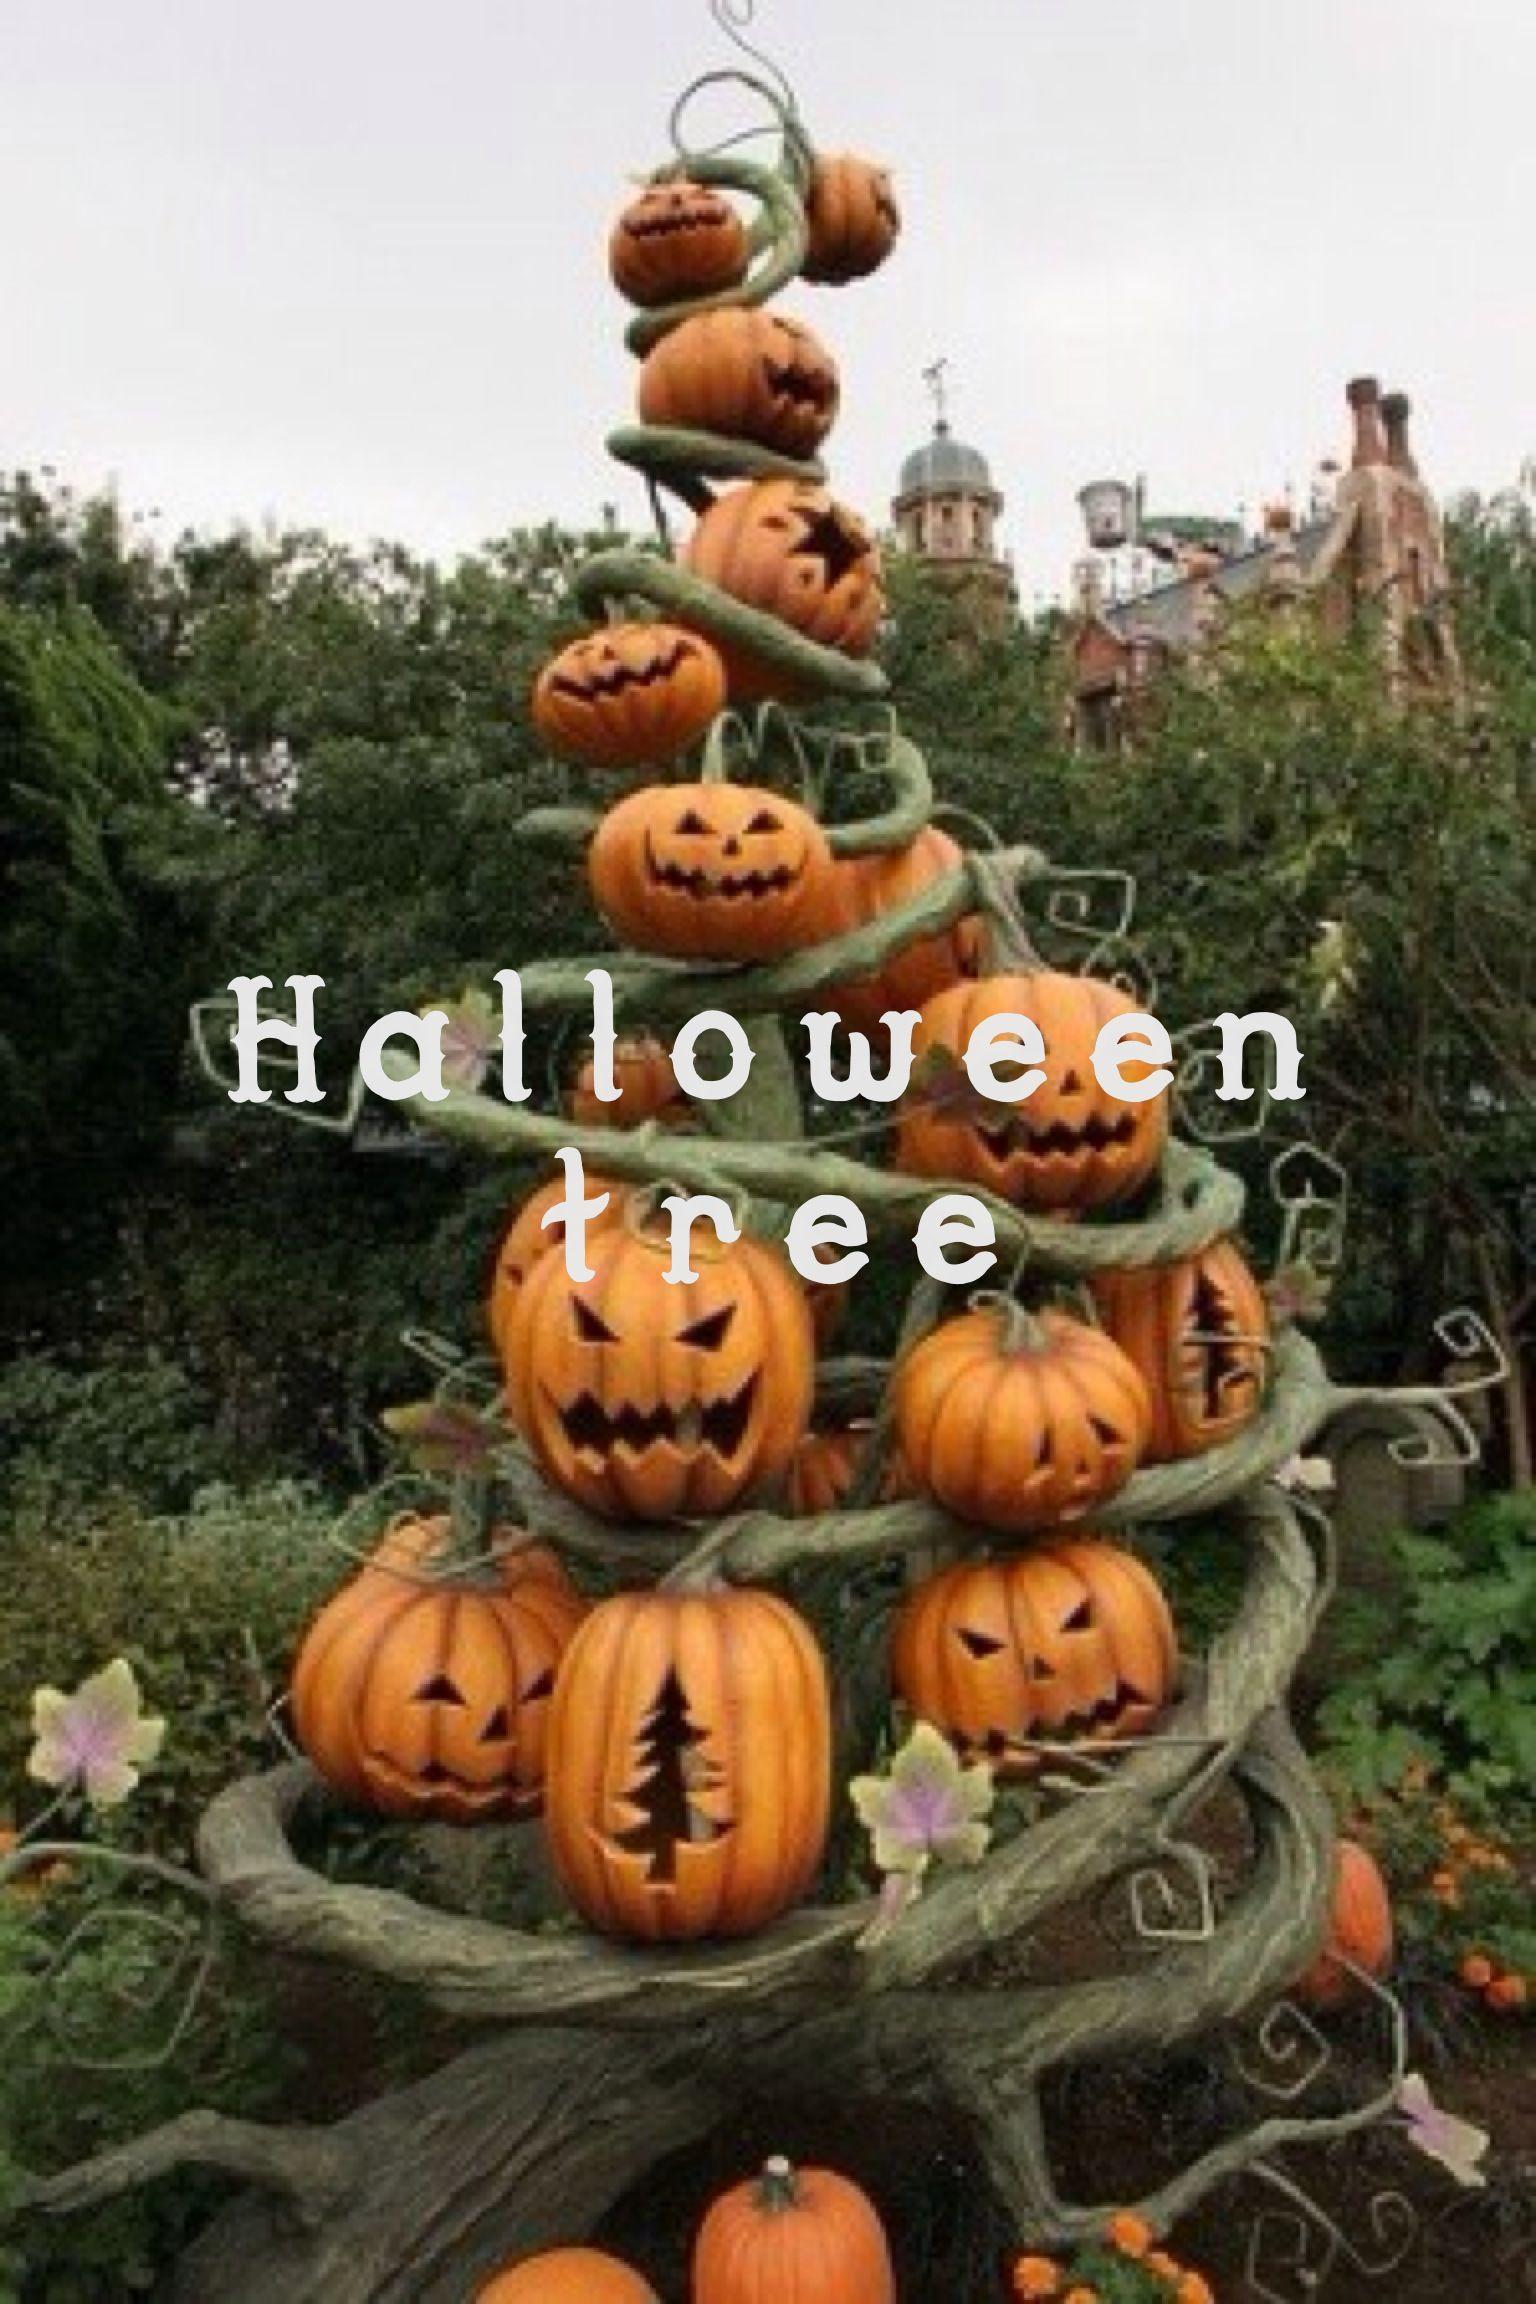 Spooky Halloween tree Halloween Pinterest Halloween trees - Spooky Halloween Decorations